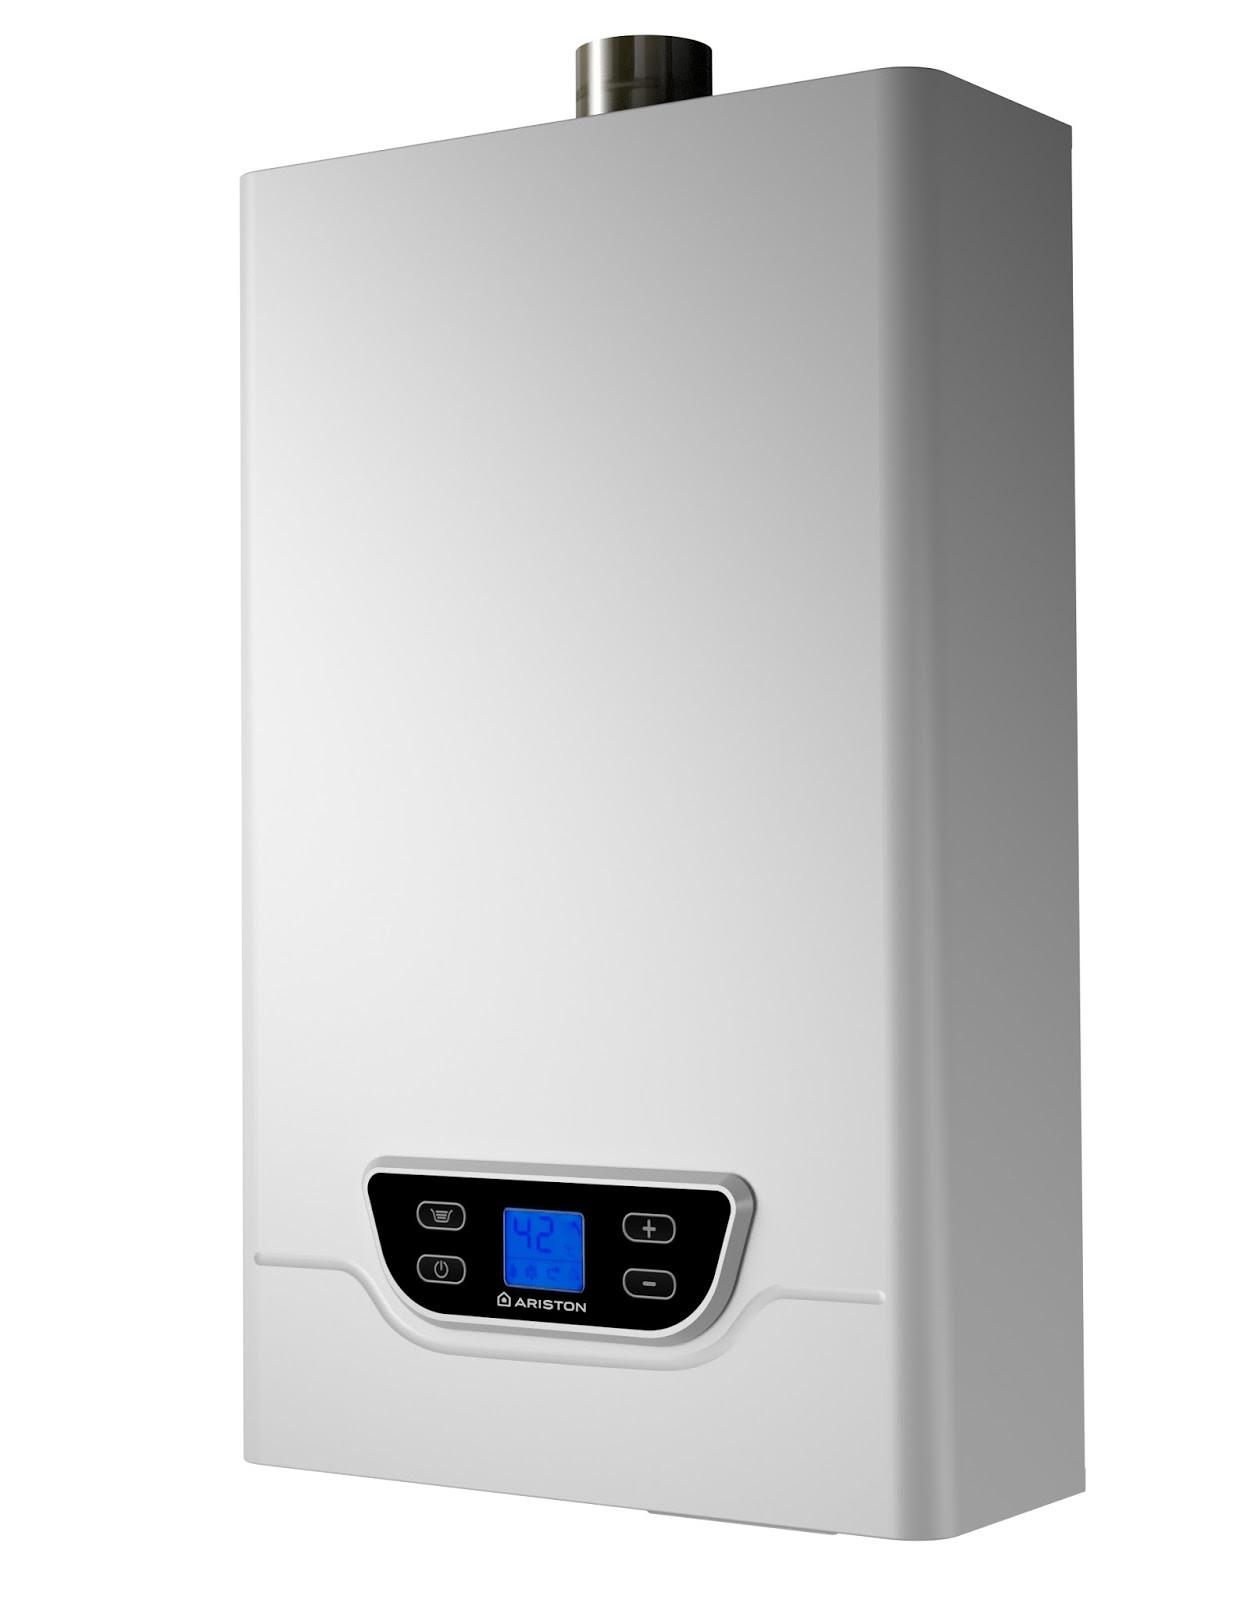 Instalaci n de calentadores para agua caliente calderas - Calentadores de gas butano precios ...